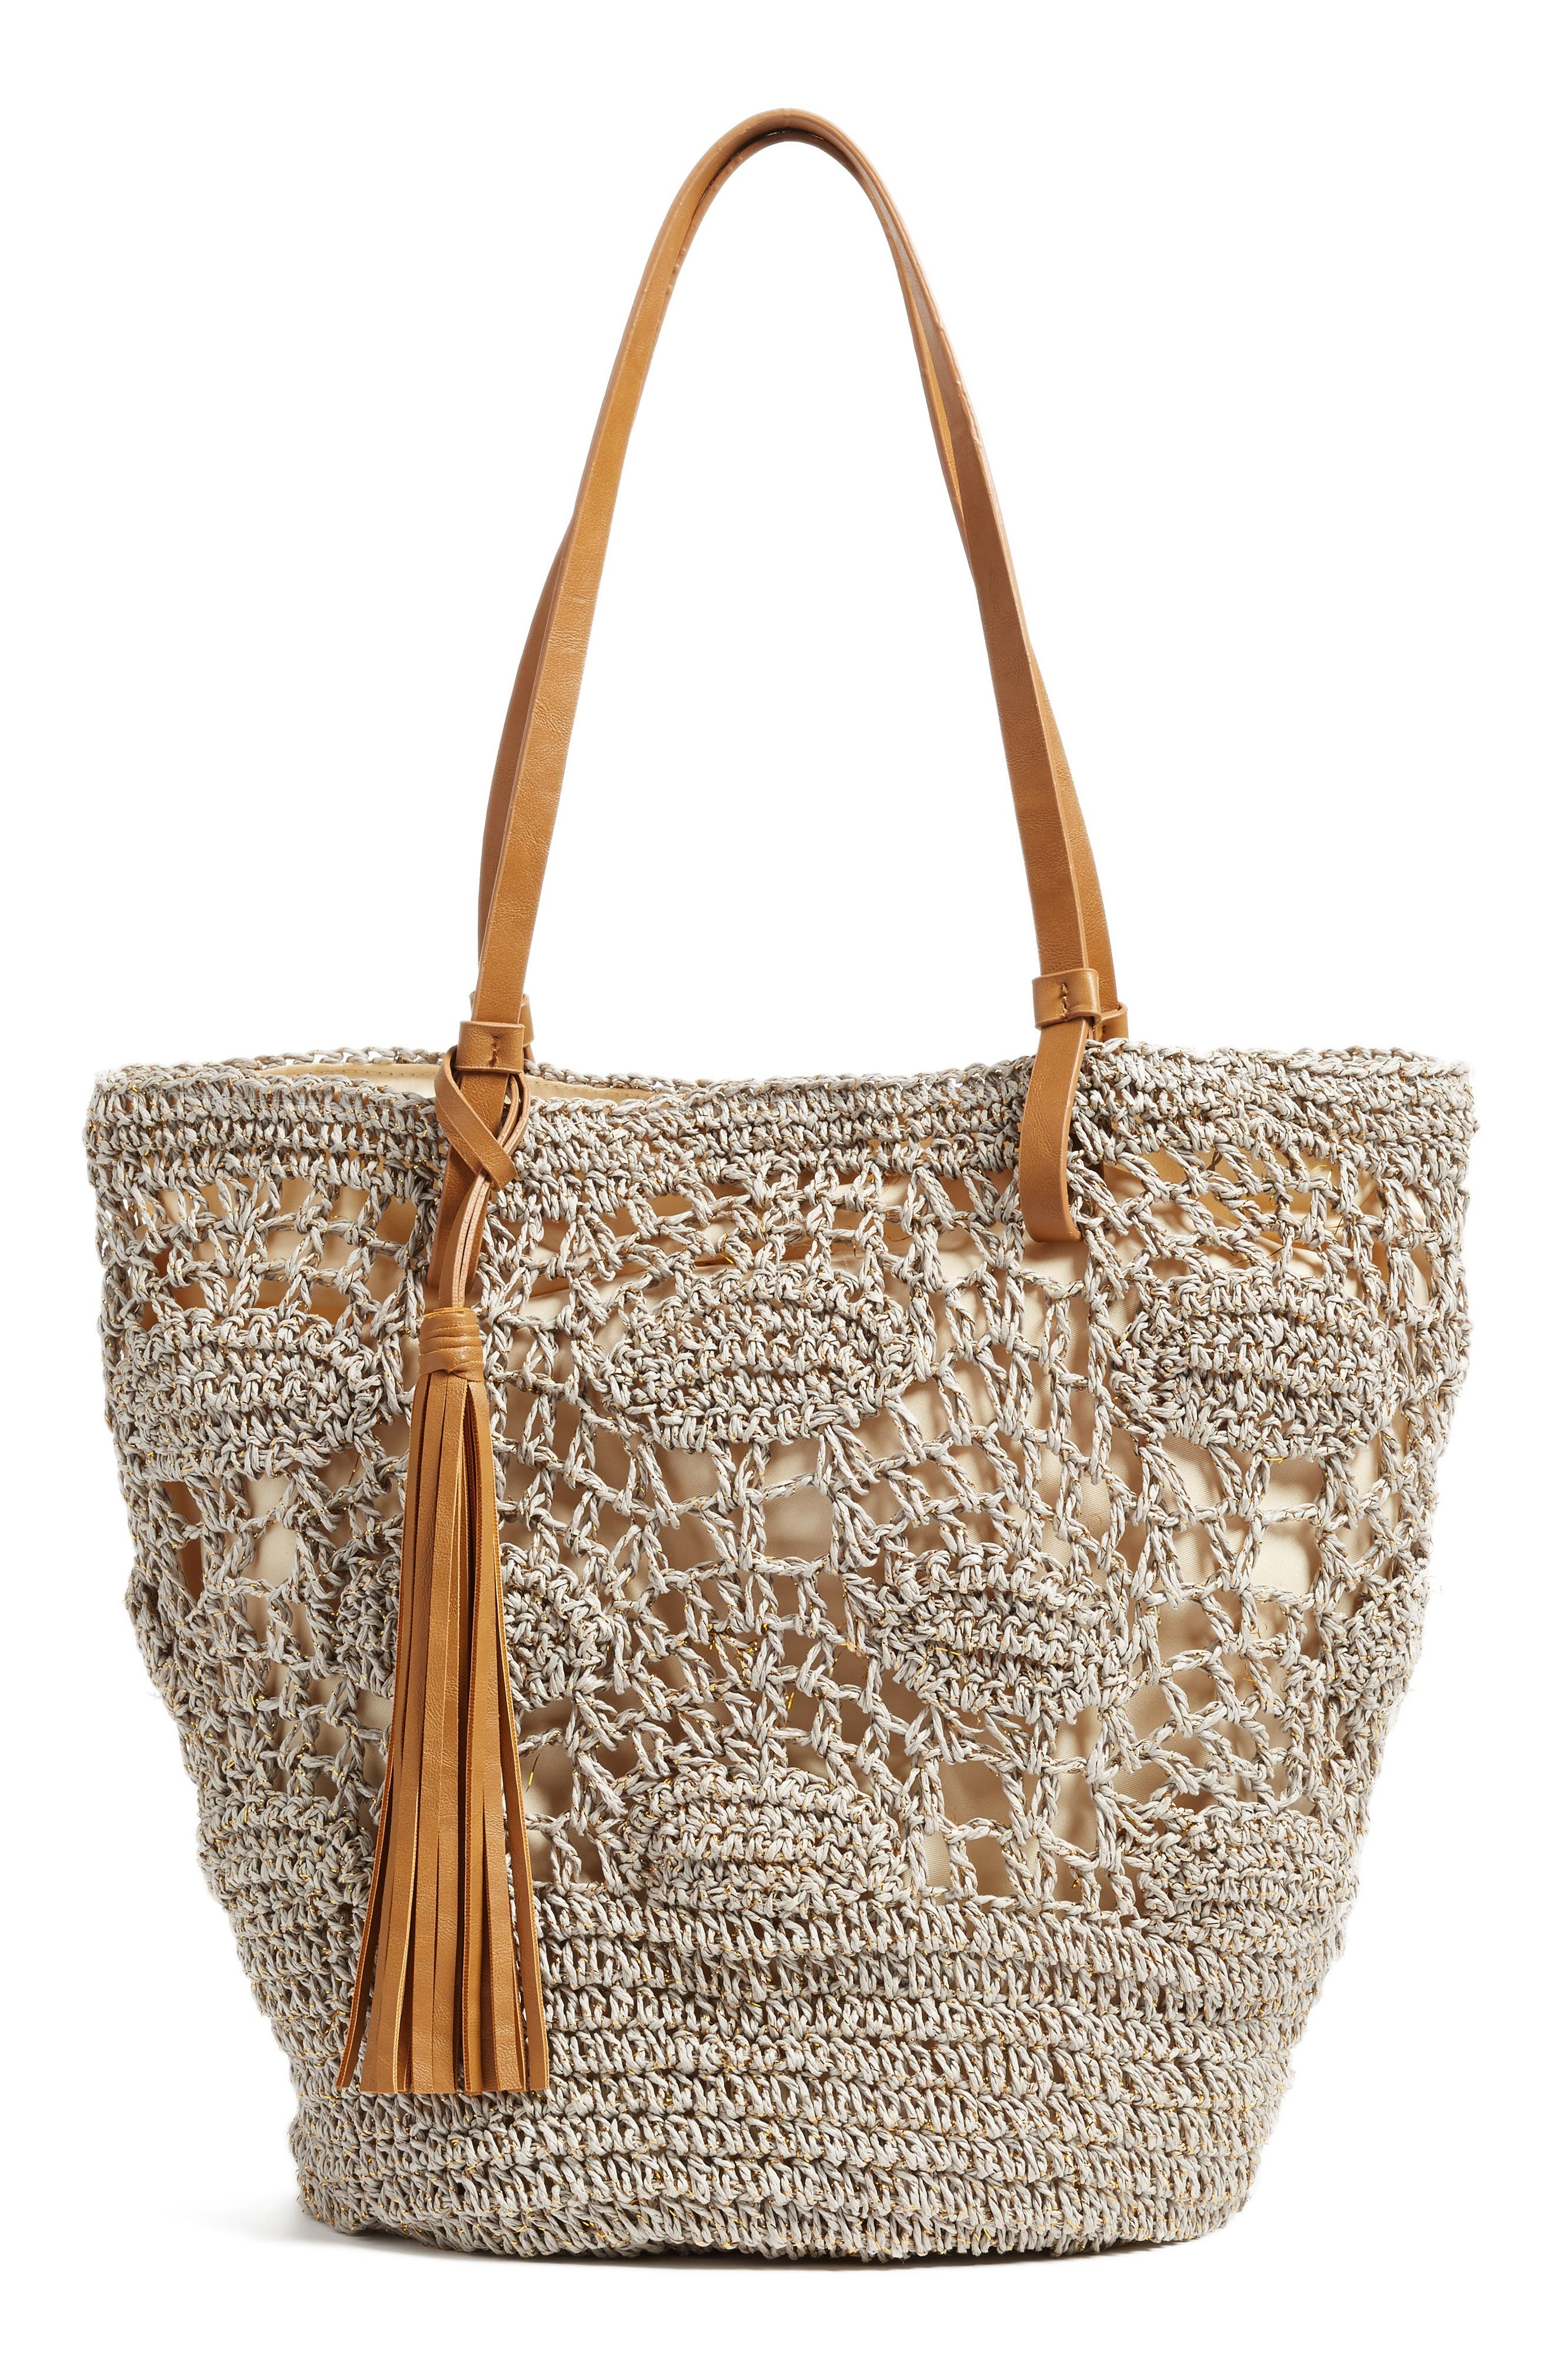 Alternate Image 1 Selected - Nordstrom Crochet Straw Tote